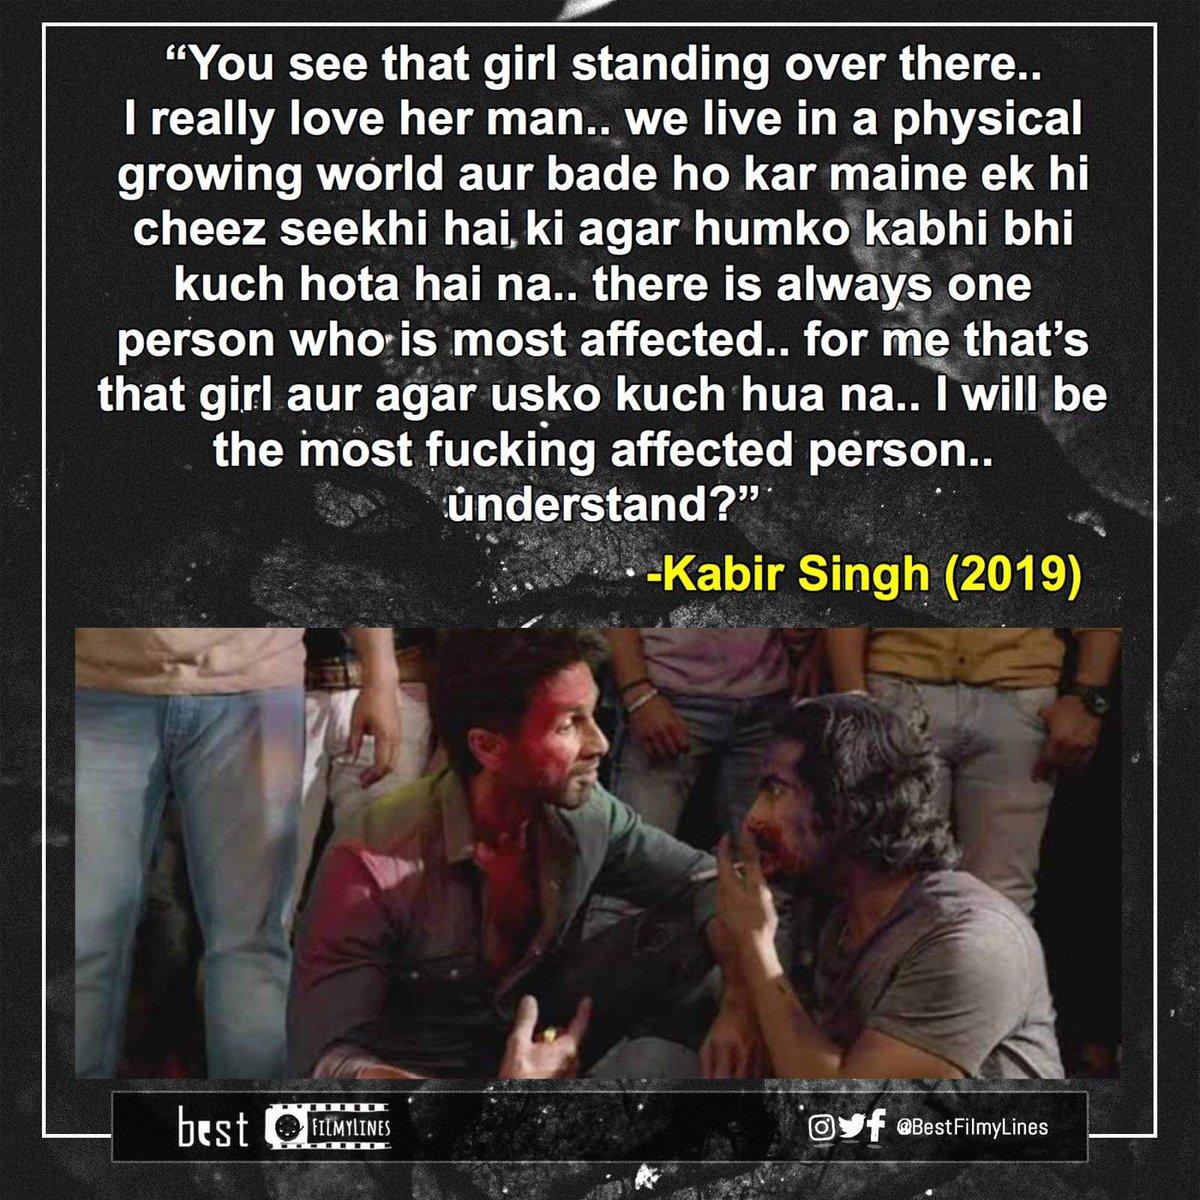 -Kabir Singh (2019), dir. Sandeep Reddy Vanga  #bollywood #bollywoodmovie #bollywoodmovies #bollywooddialogue #indiancinema #hindi #hindimovie #dialogue #dialogues #quote #quotes #rvcjinsta #bestfilmylines #kabirsingh #shahidkapoor